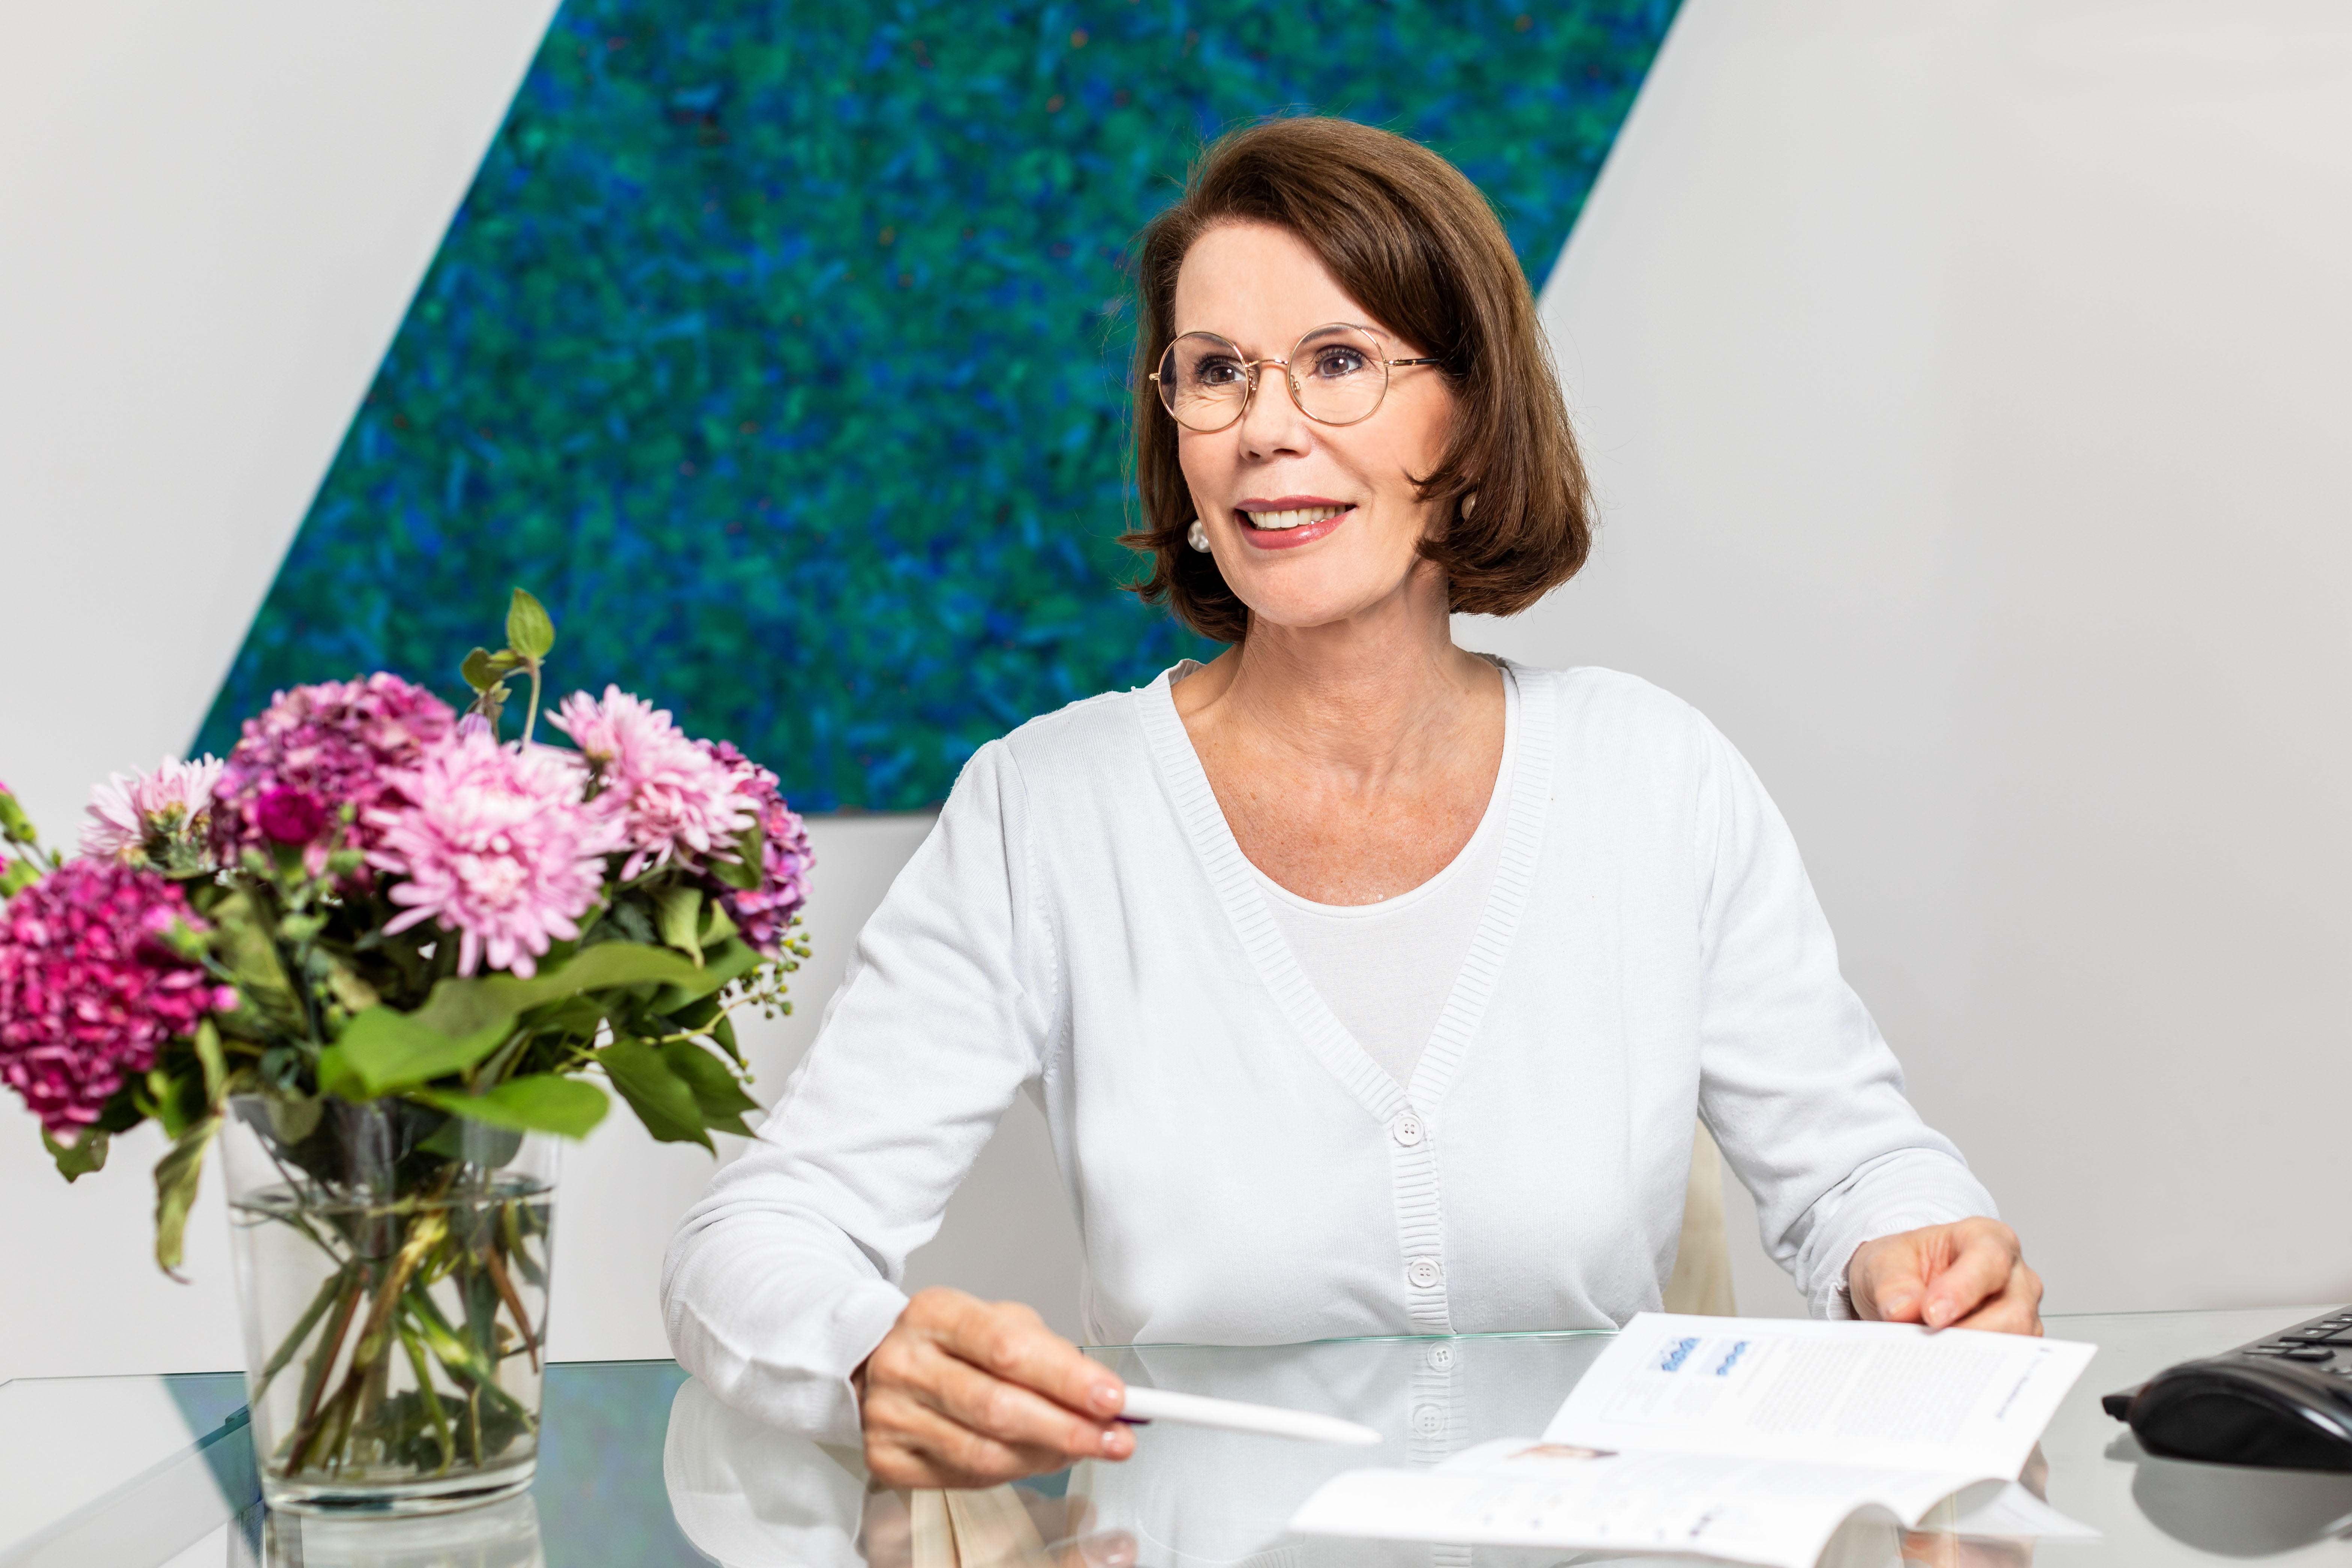 Dr. Marie Theres Brandenburg